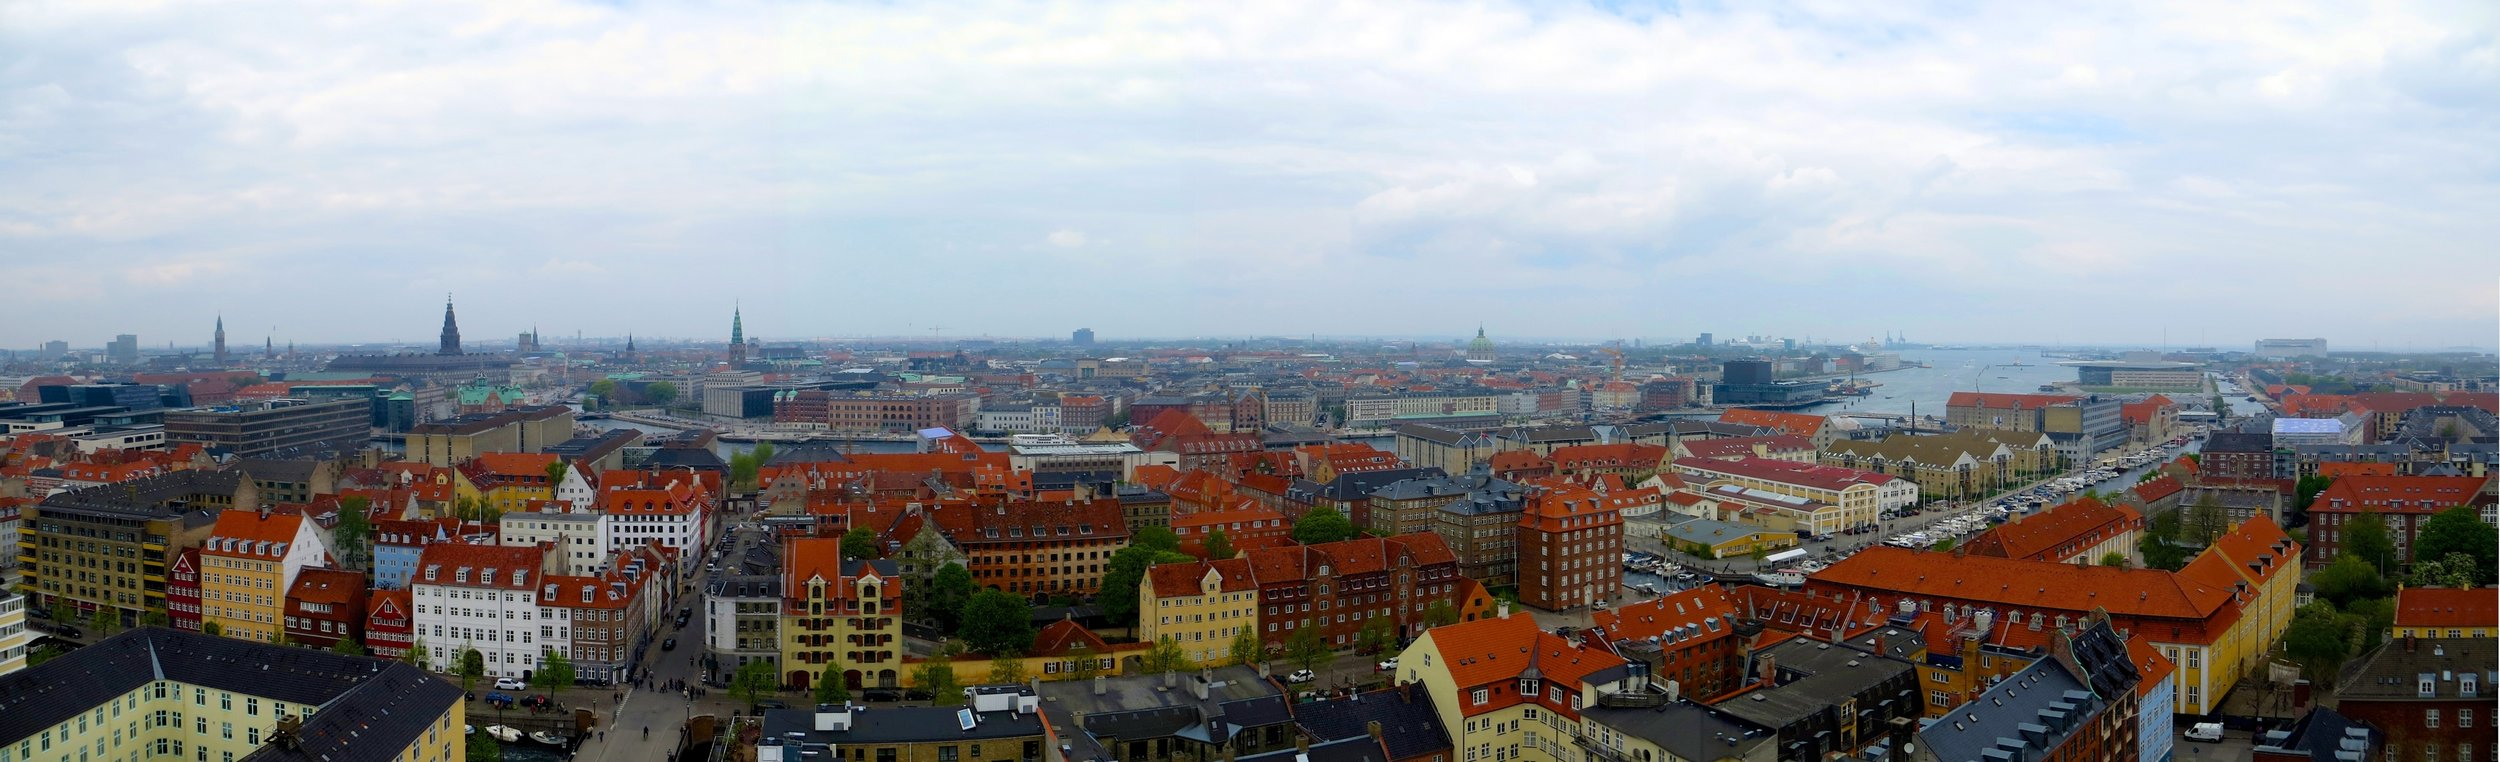 Copenhagen panorama from Vor Frelsers Kirke